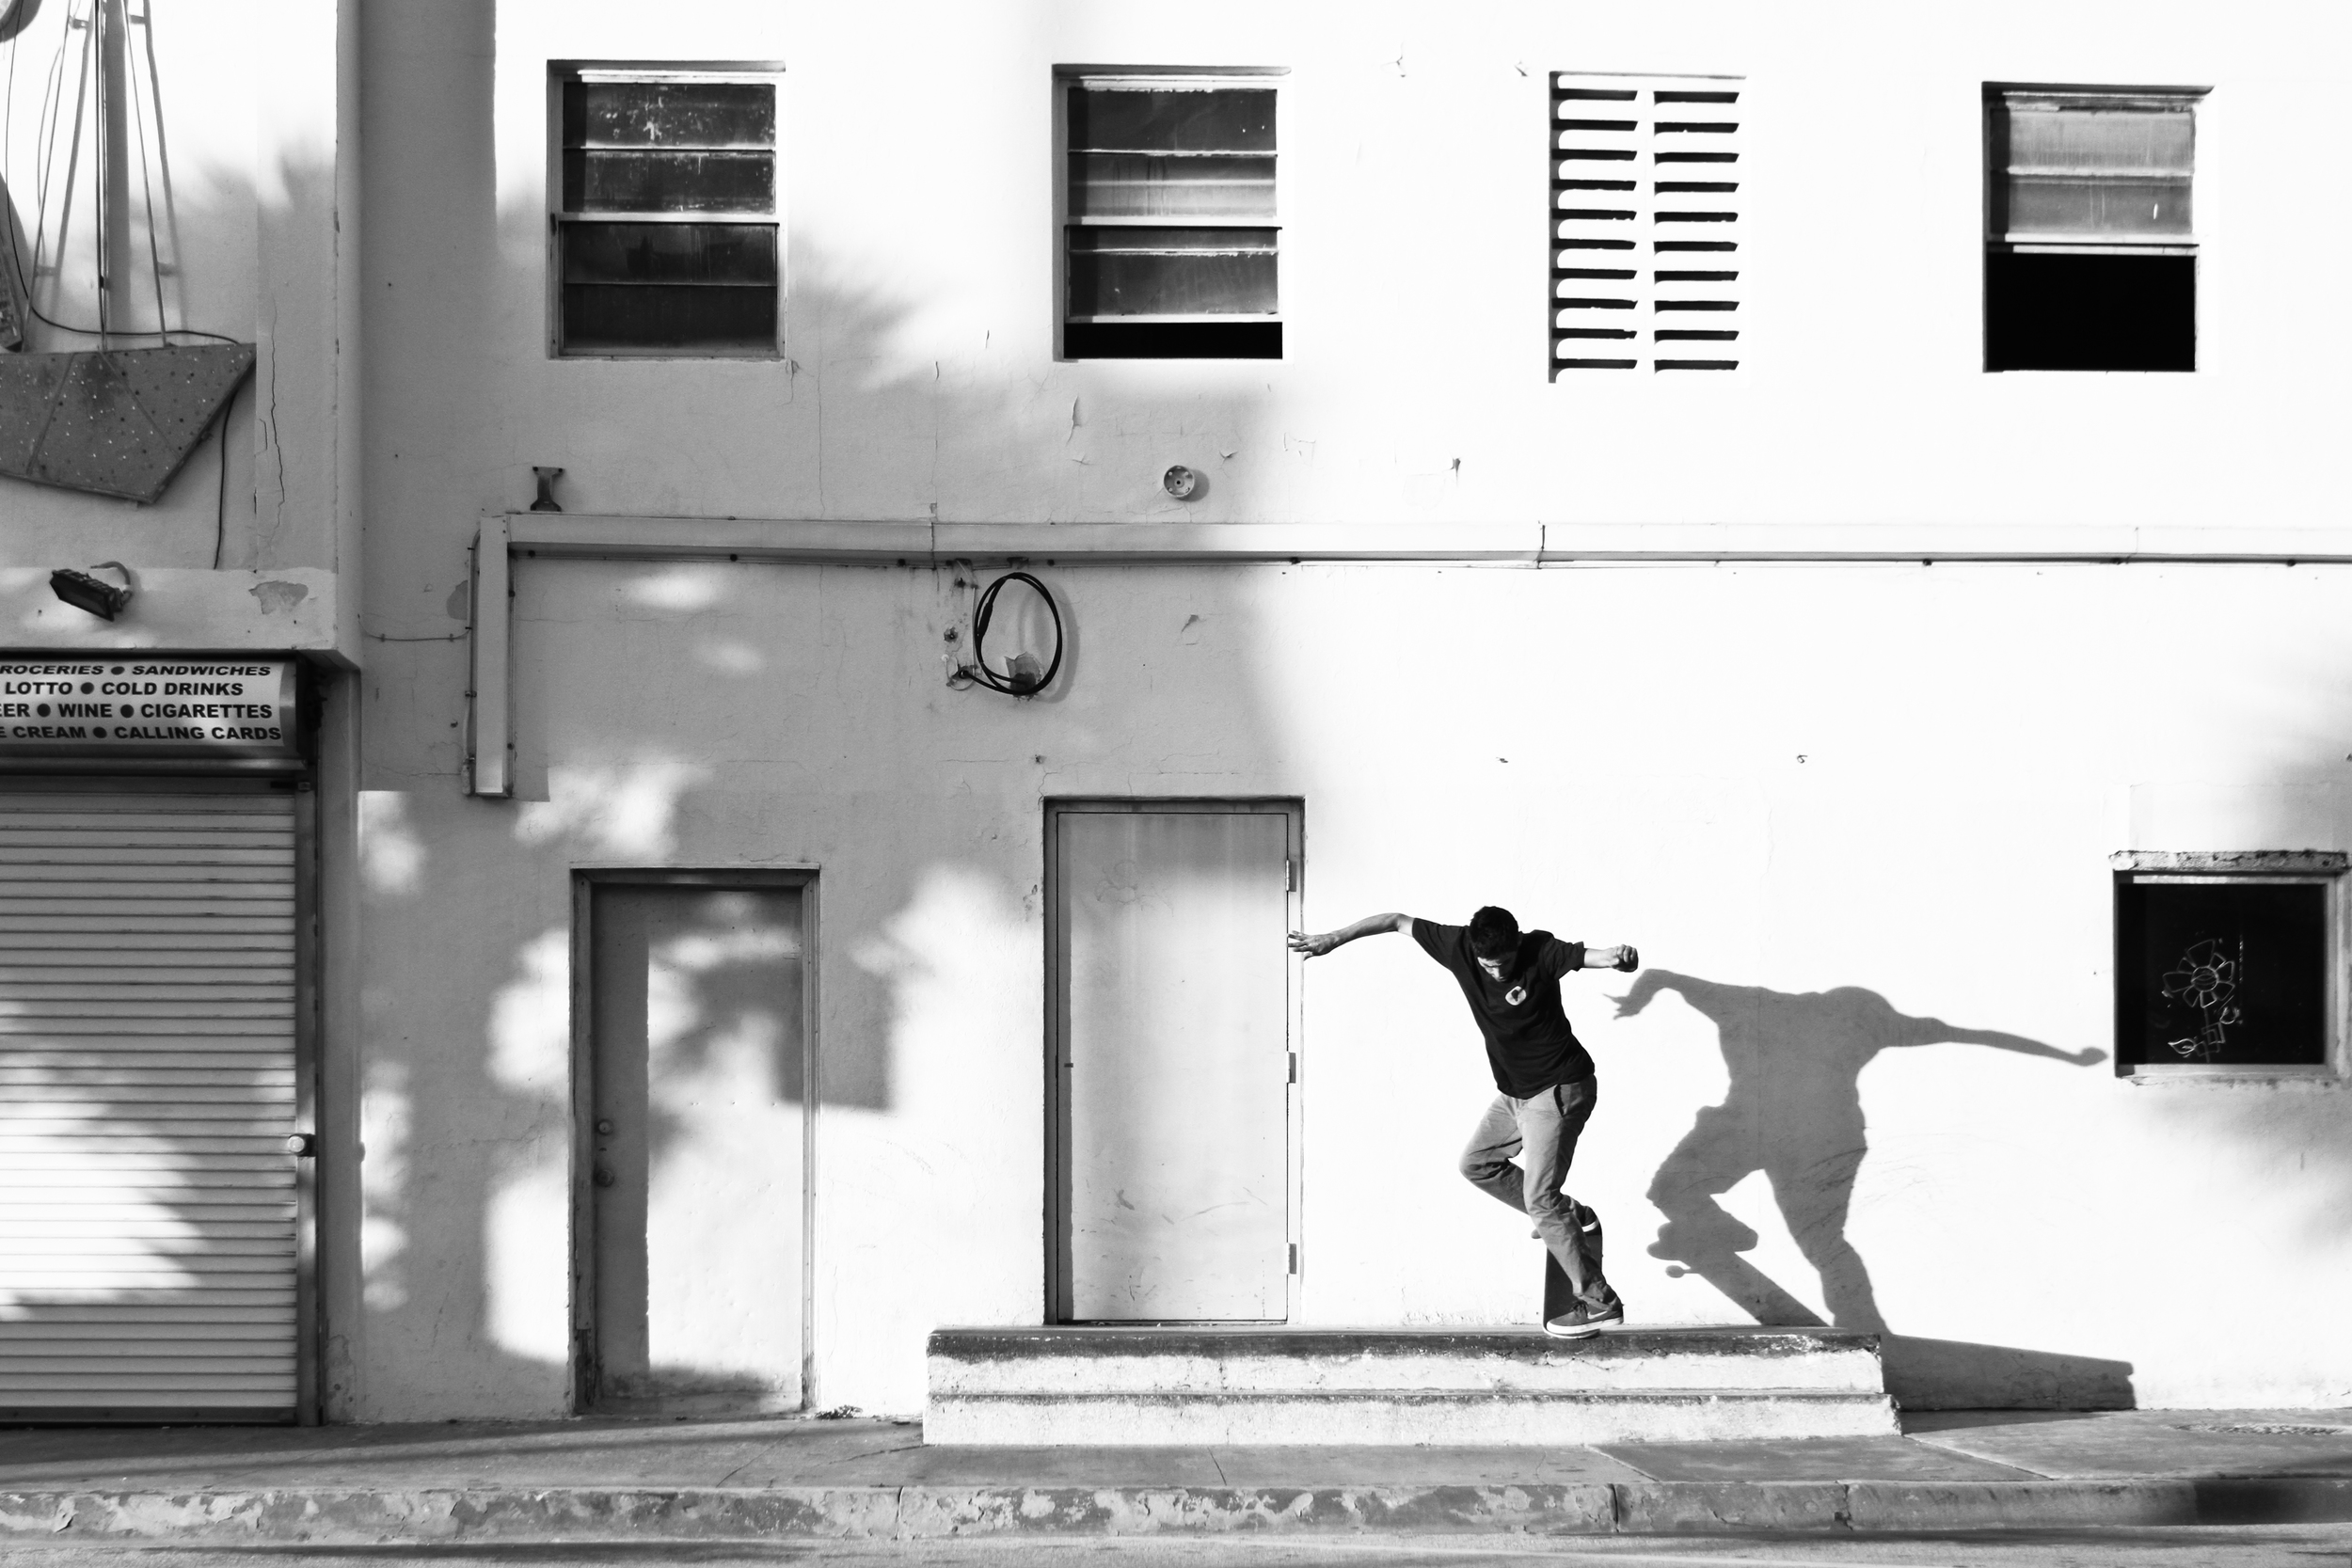 Danny Fuenzalida | Backside Noseblunt Slide | Miami Beach, FL